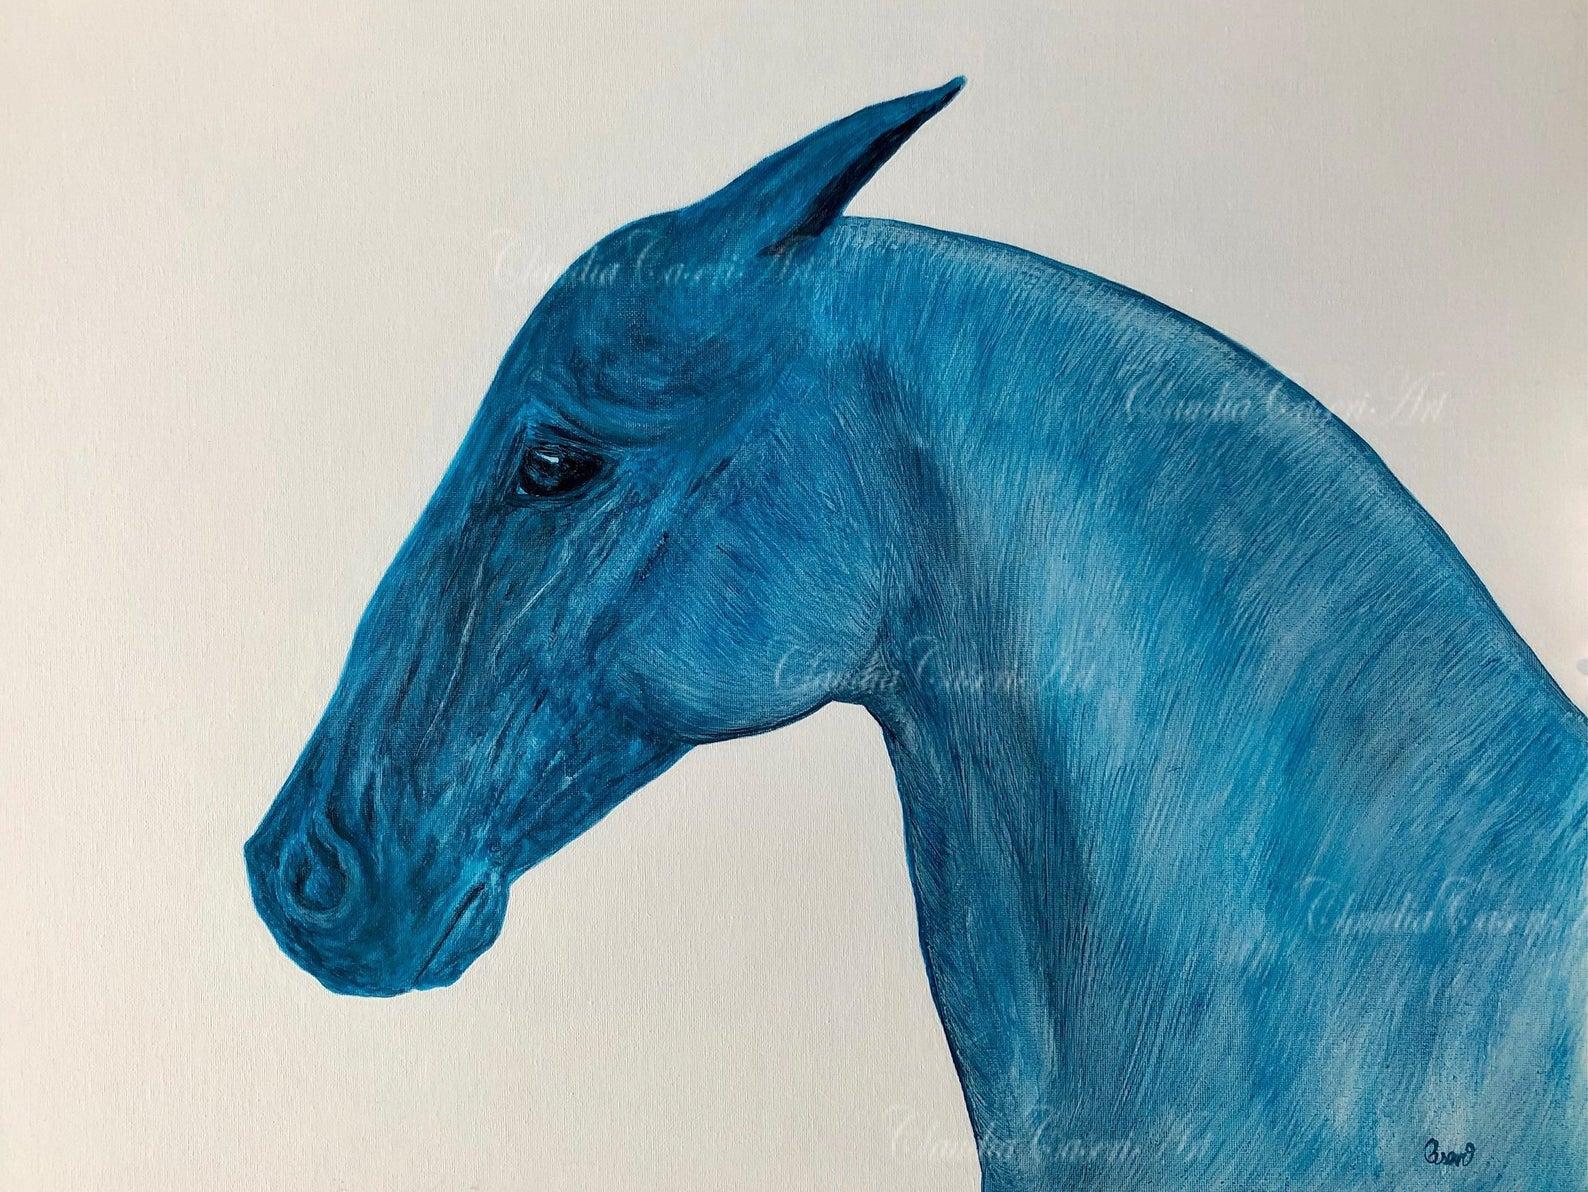 Equestrian Art on Etsy 2020